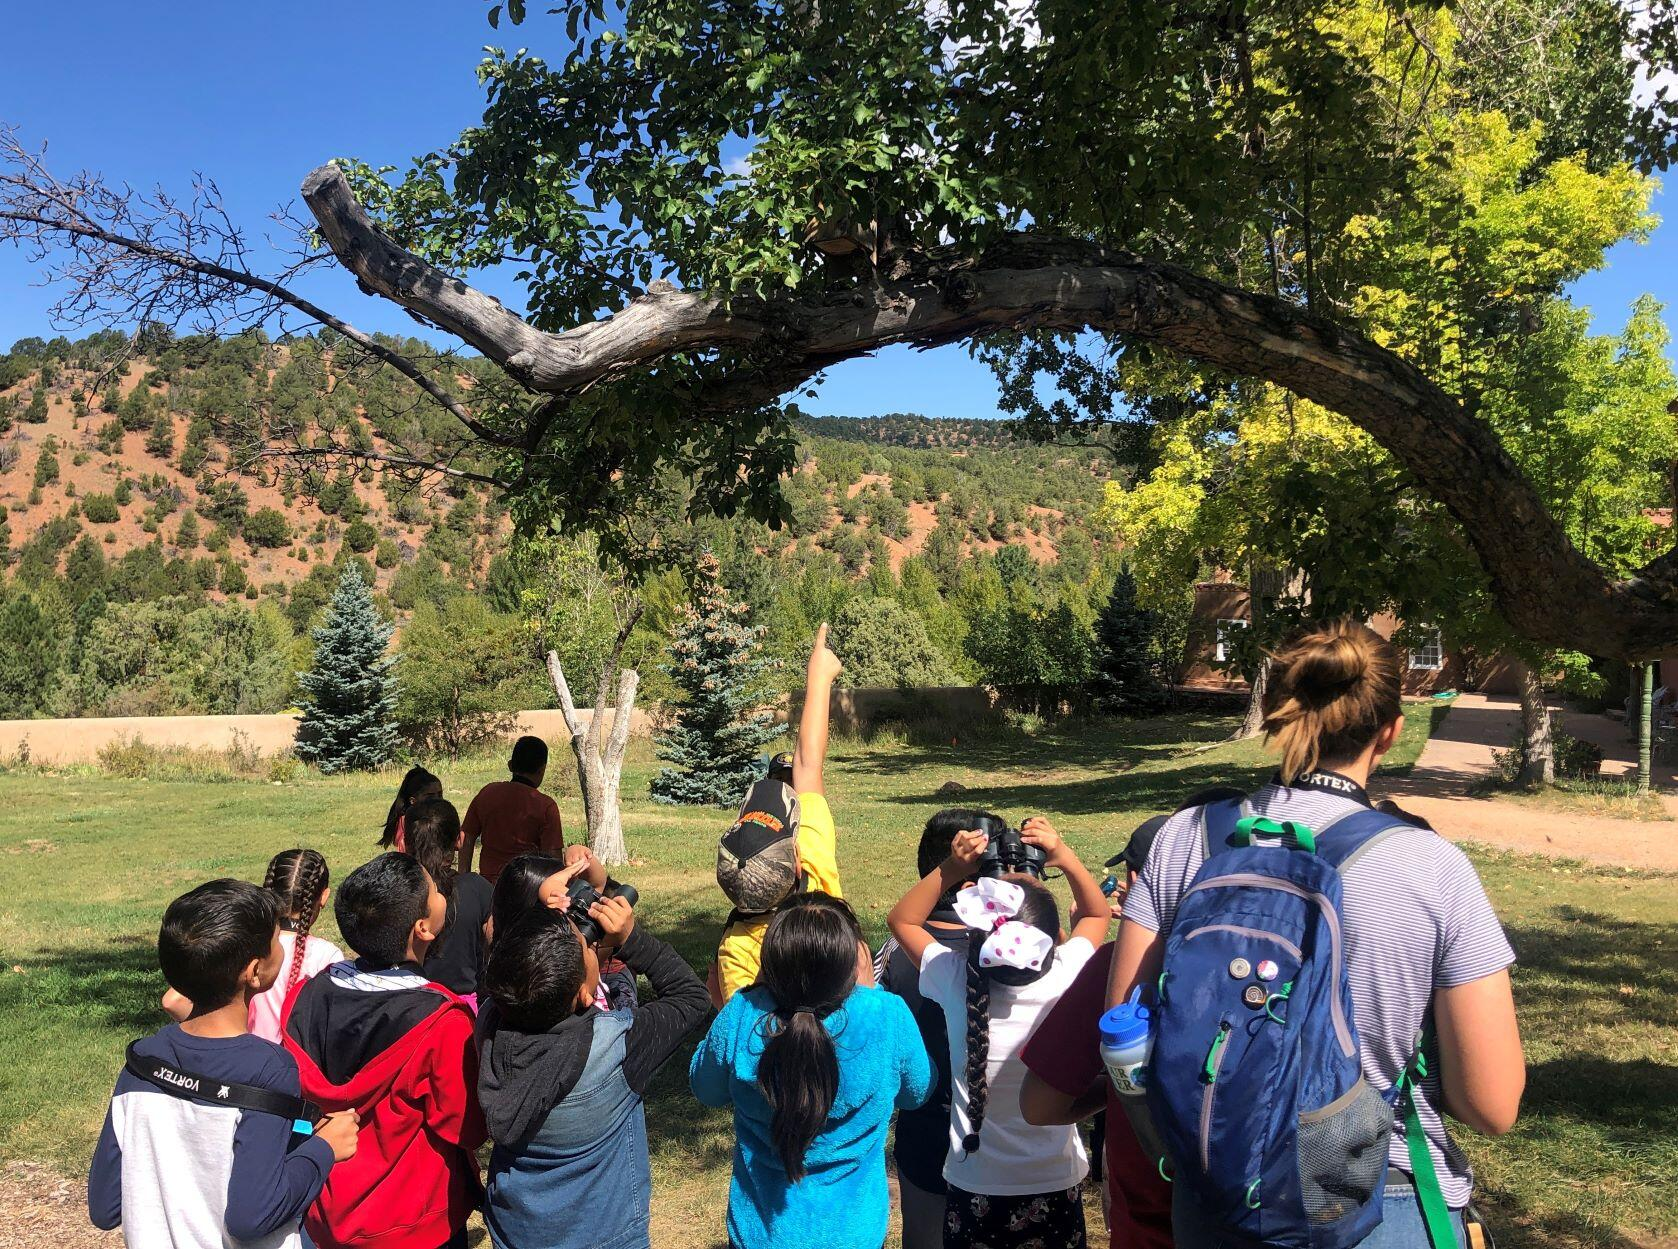 students at the Randall Davey Audubon Center & Sanctuary